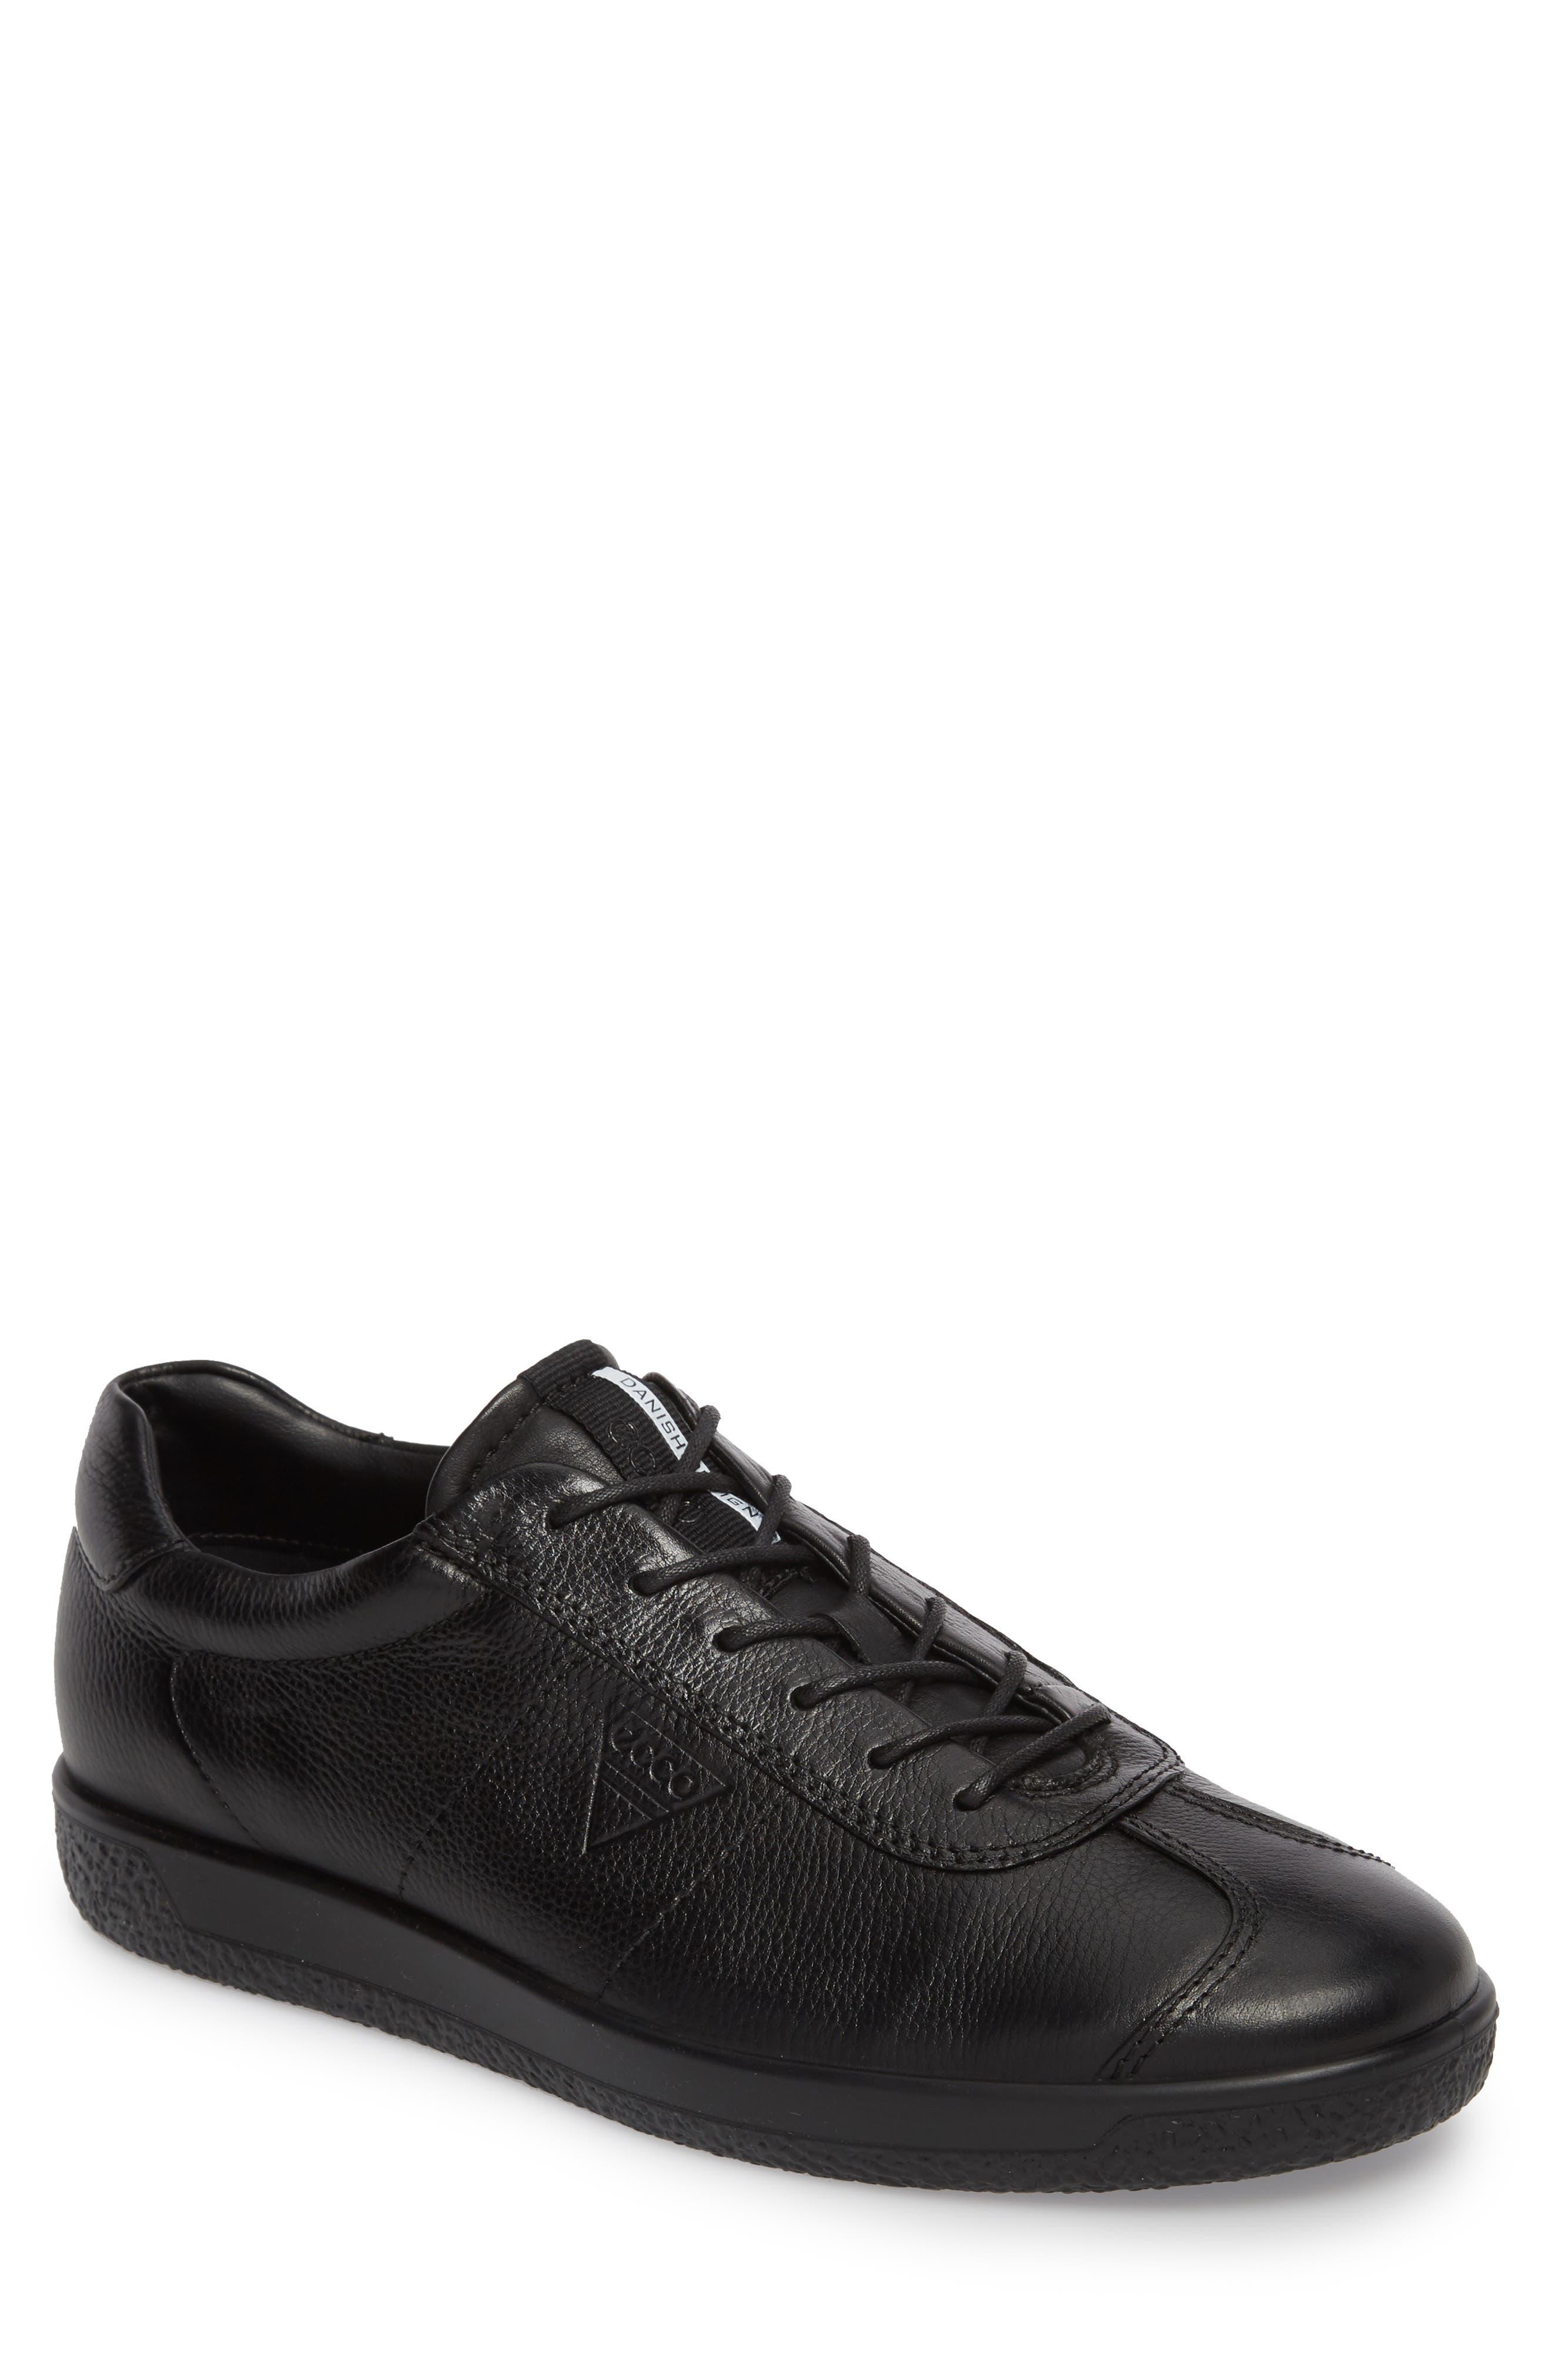 Soft 1 Sneaker,                             Main thumbnail 1, color,                             008